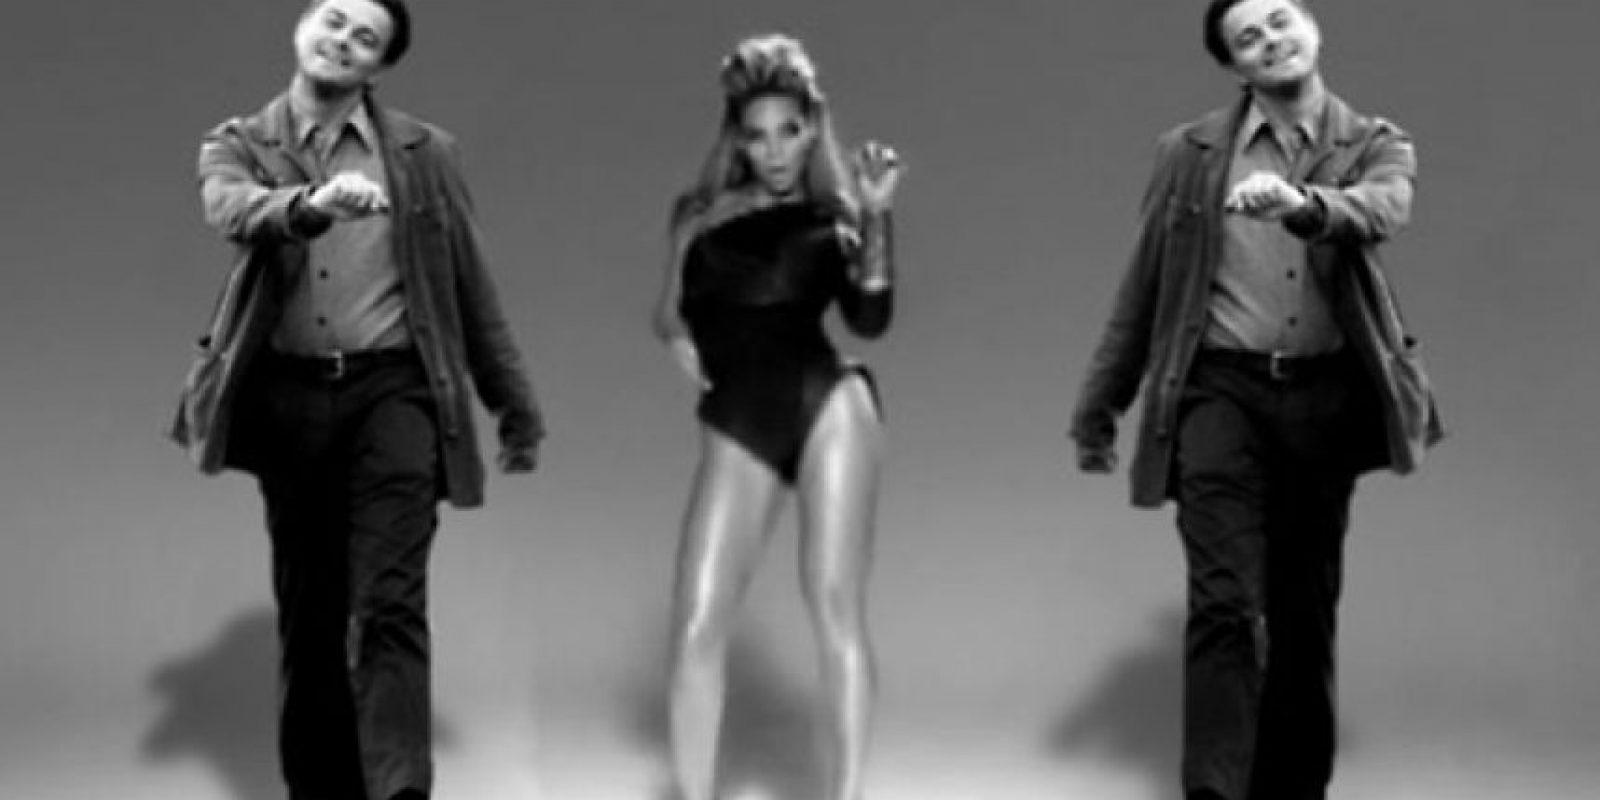 Leonardo DiCaprio acompaña a Beyoncé Foto:YourOwnMeme